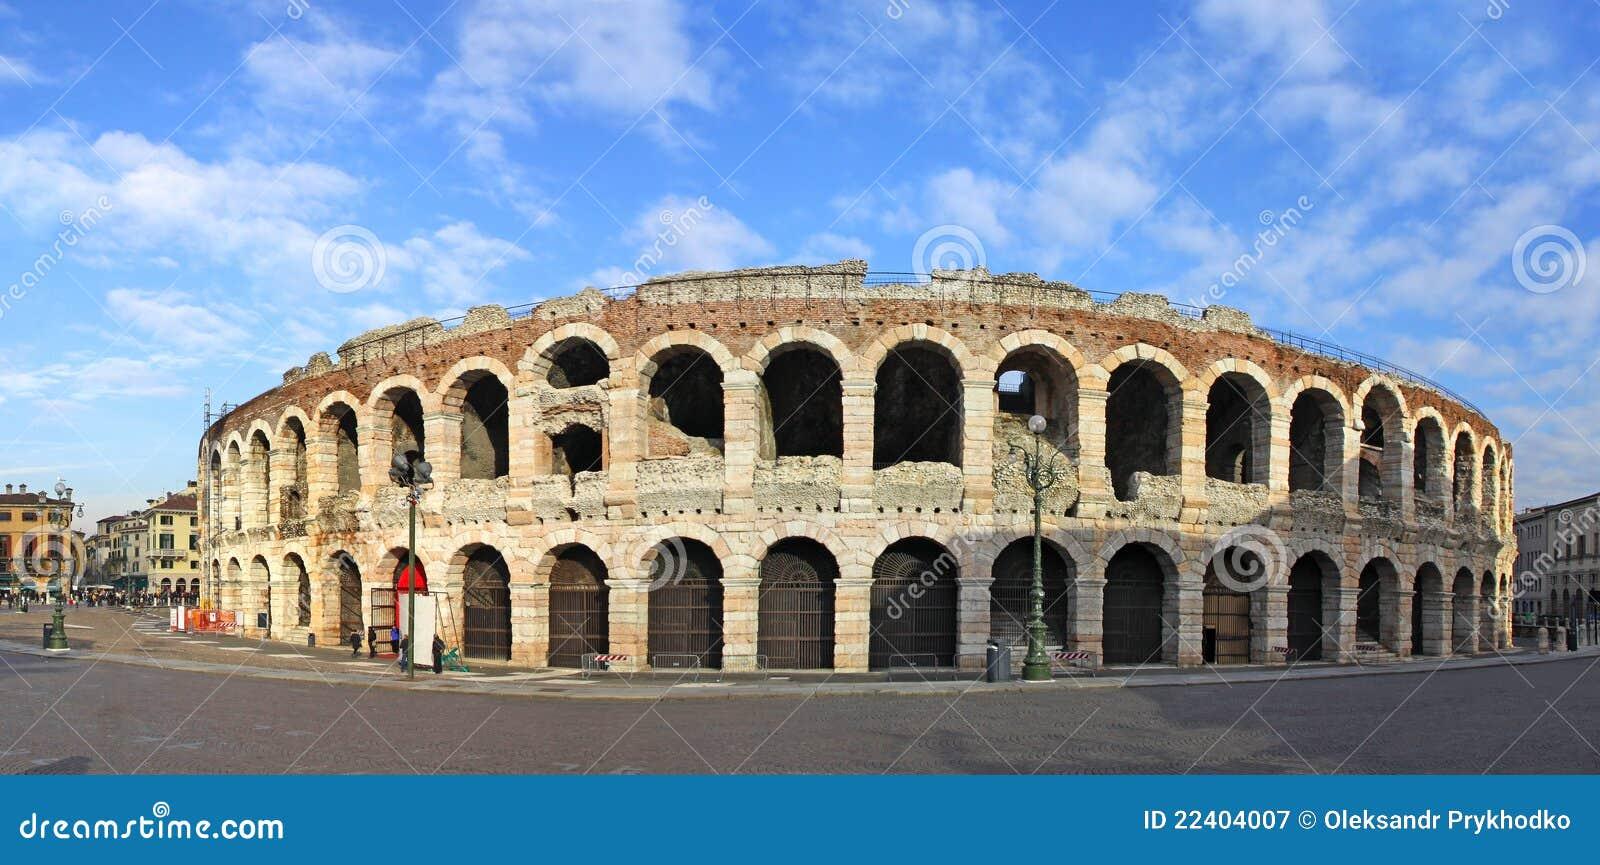 Arena romana antiga do amphitheatre em Verona